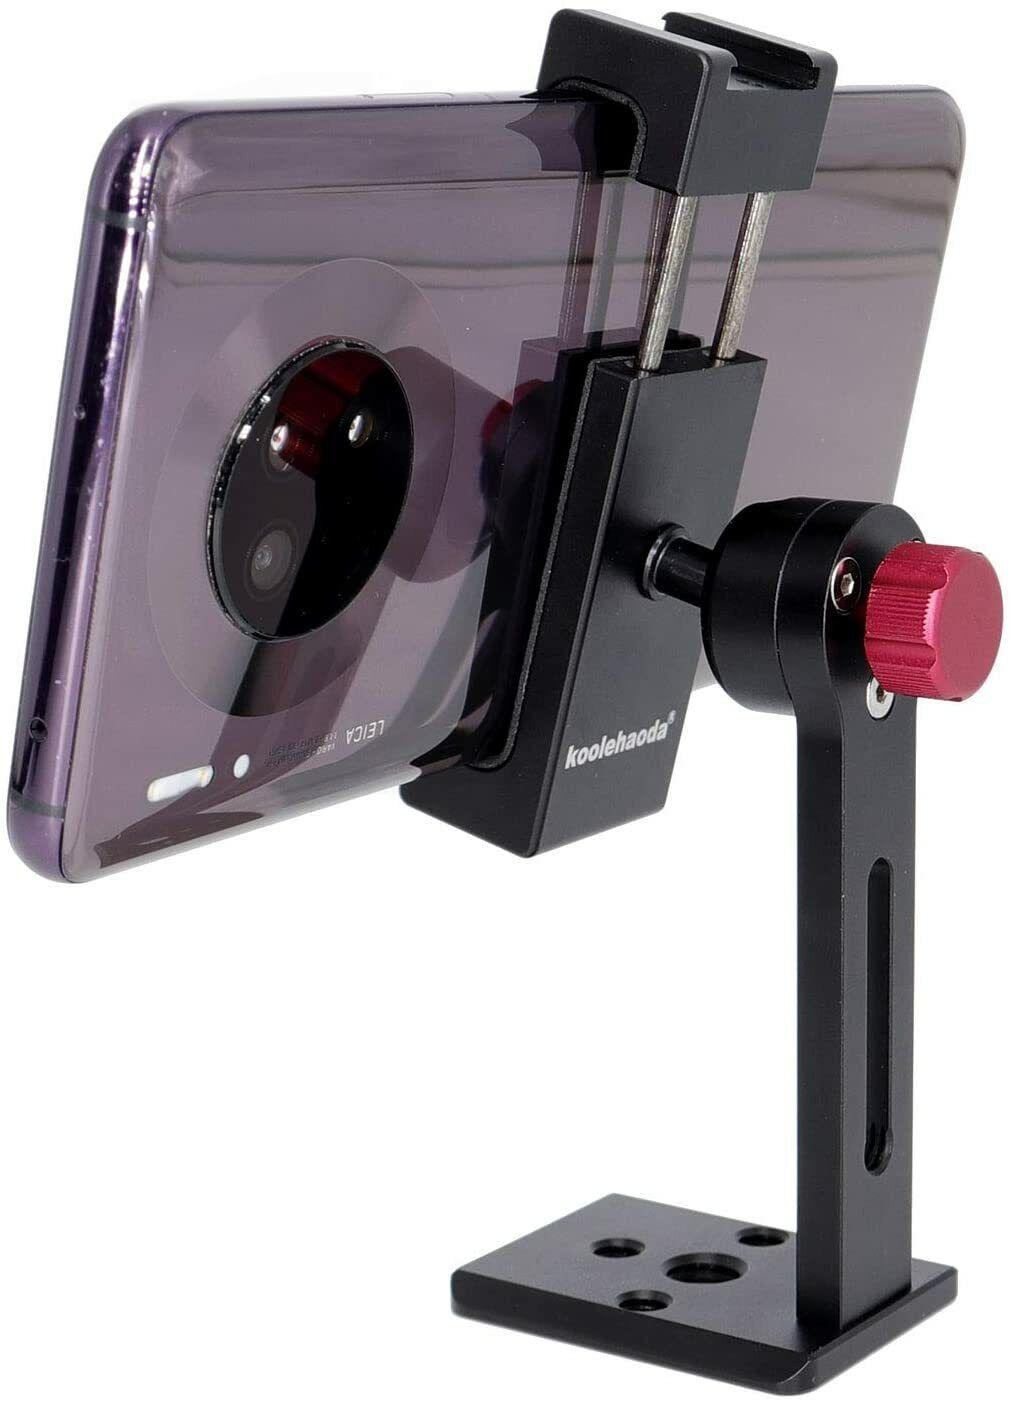 Koolehaoda Phone Tripod Mount Adapter with Cold Shoe, Smartp